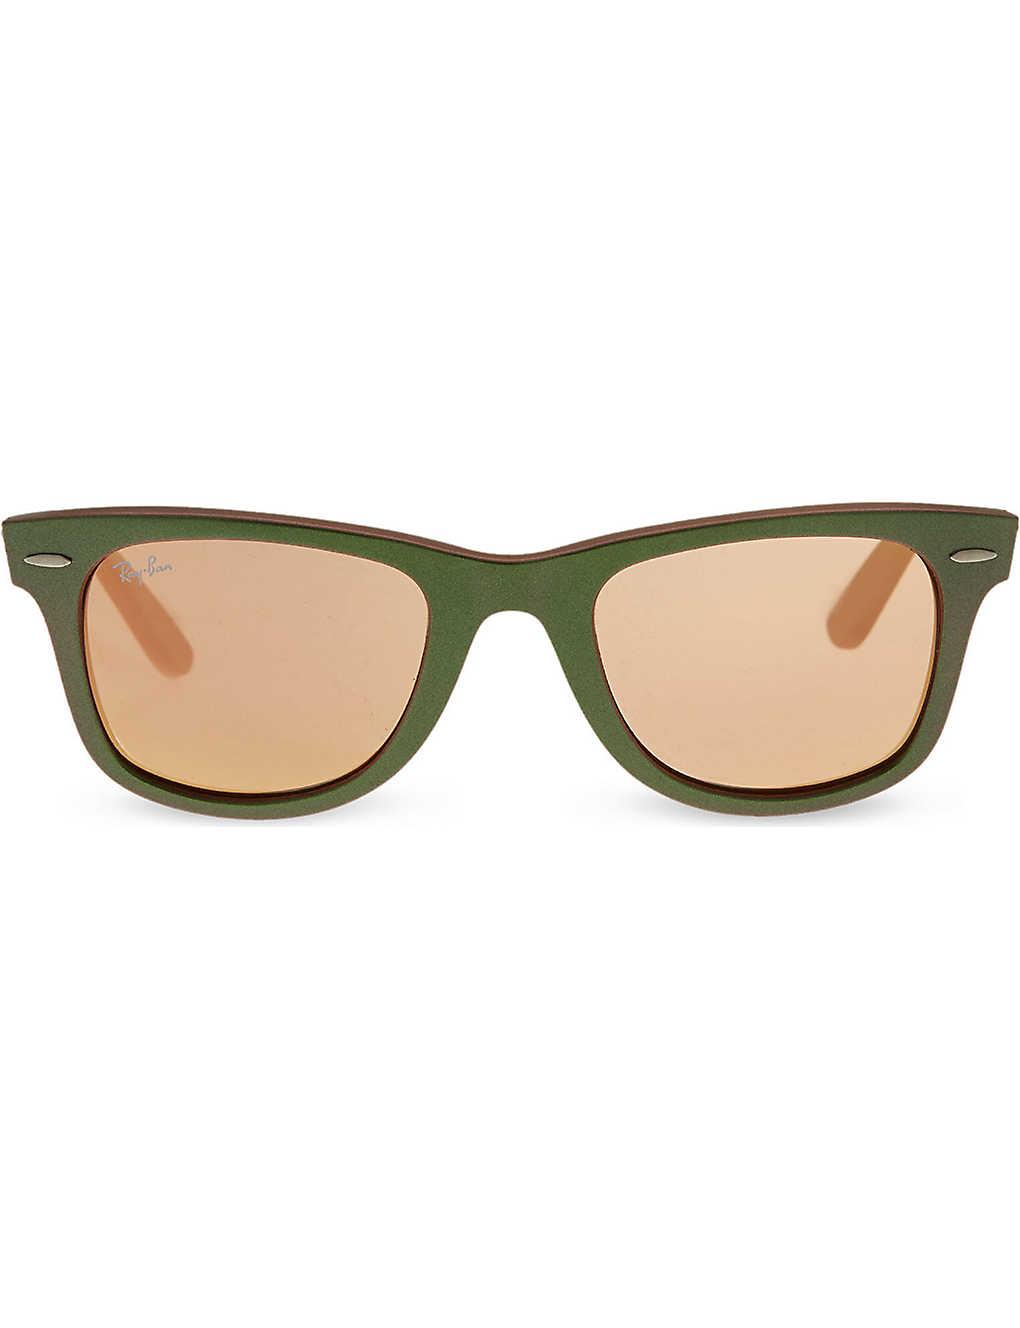 38205fe16 RAY-BAN - Green wayfarer sunglasses with mirrored lenses RB2140 ...